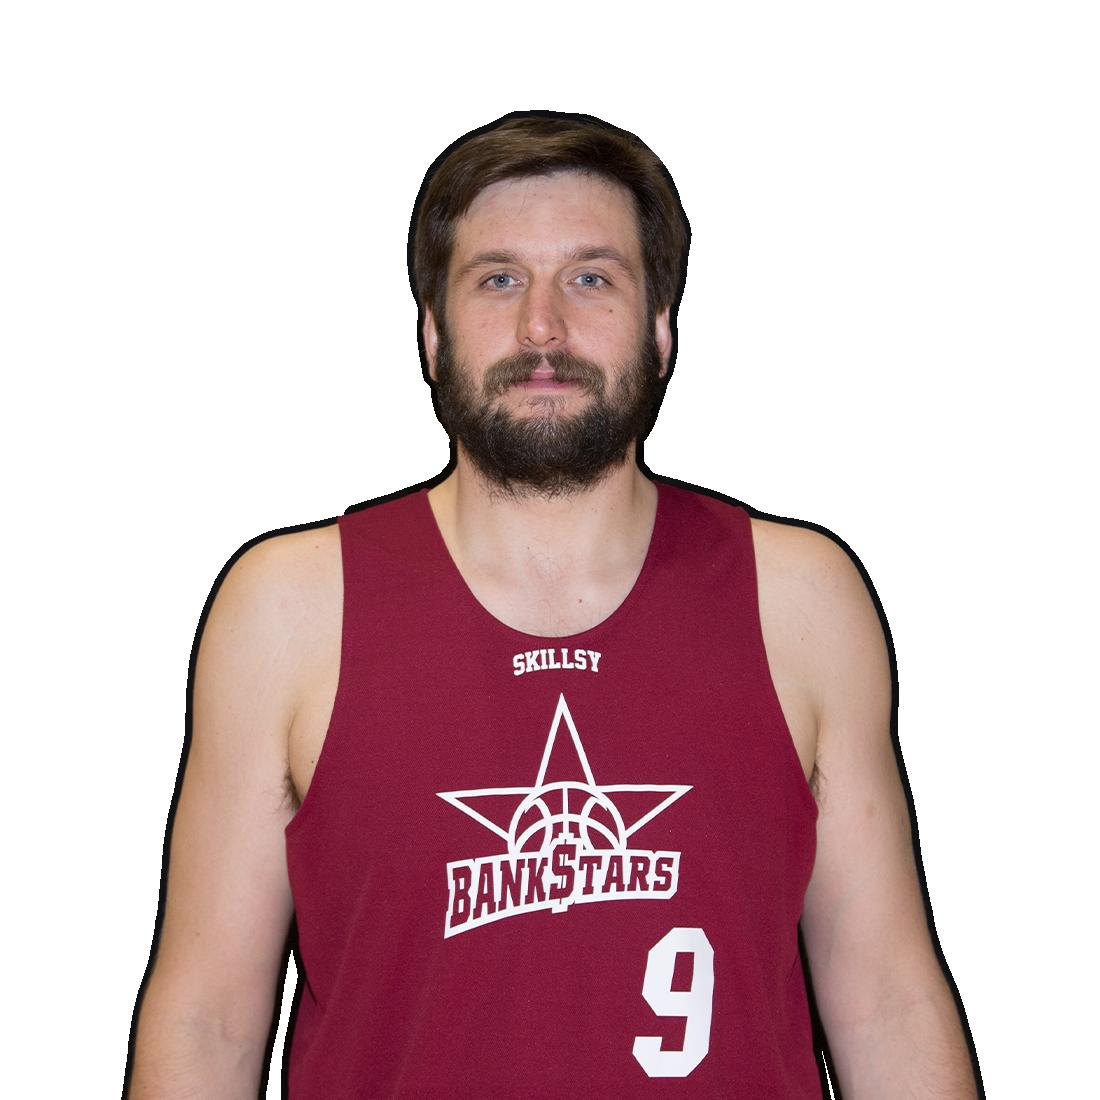 Krzysztof Heymer